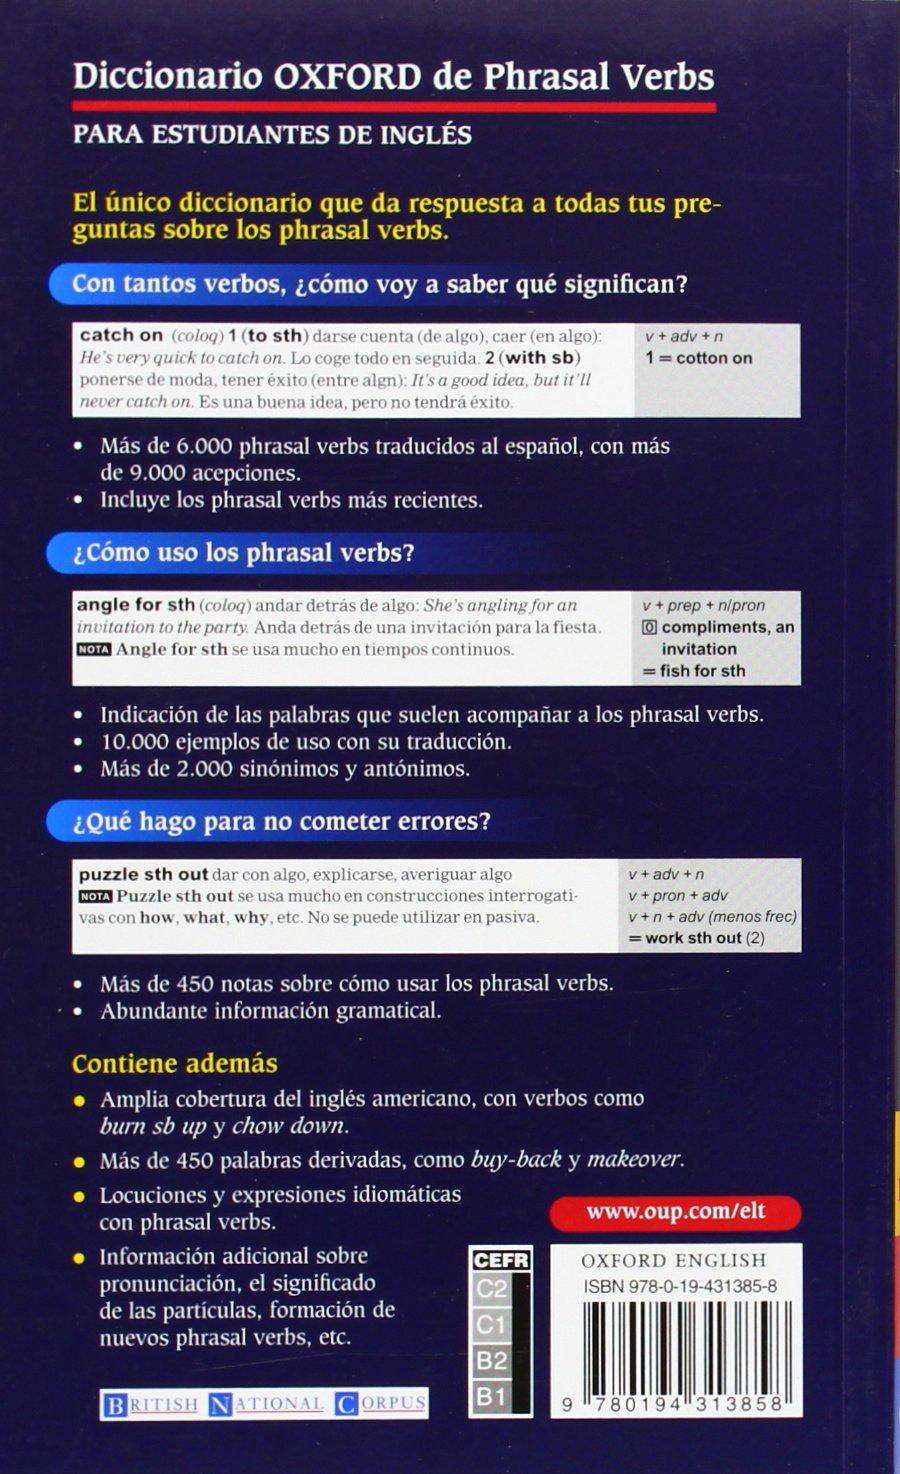 Amazon.com: Diccionario Oxford de Phrasal Verbs (para Estudiantes de Ingles)  (9780194313858): Angeles Perez Alonso: Books